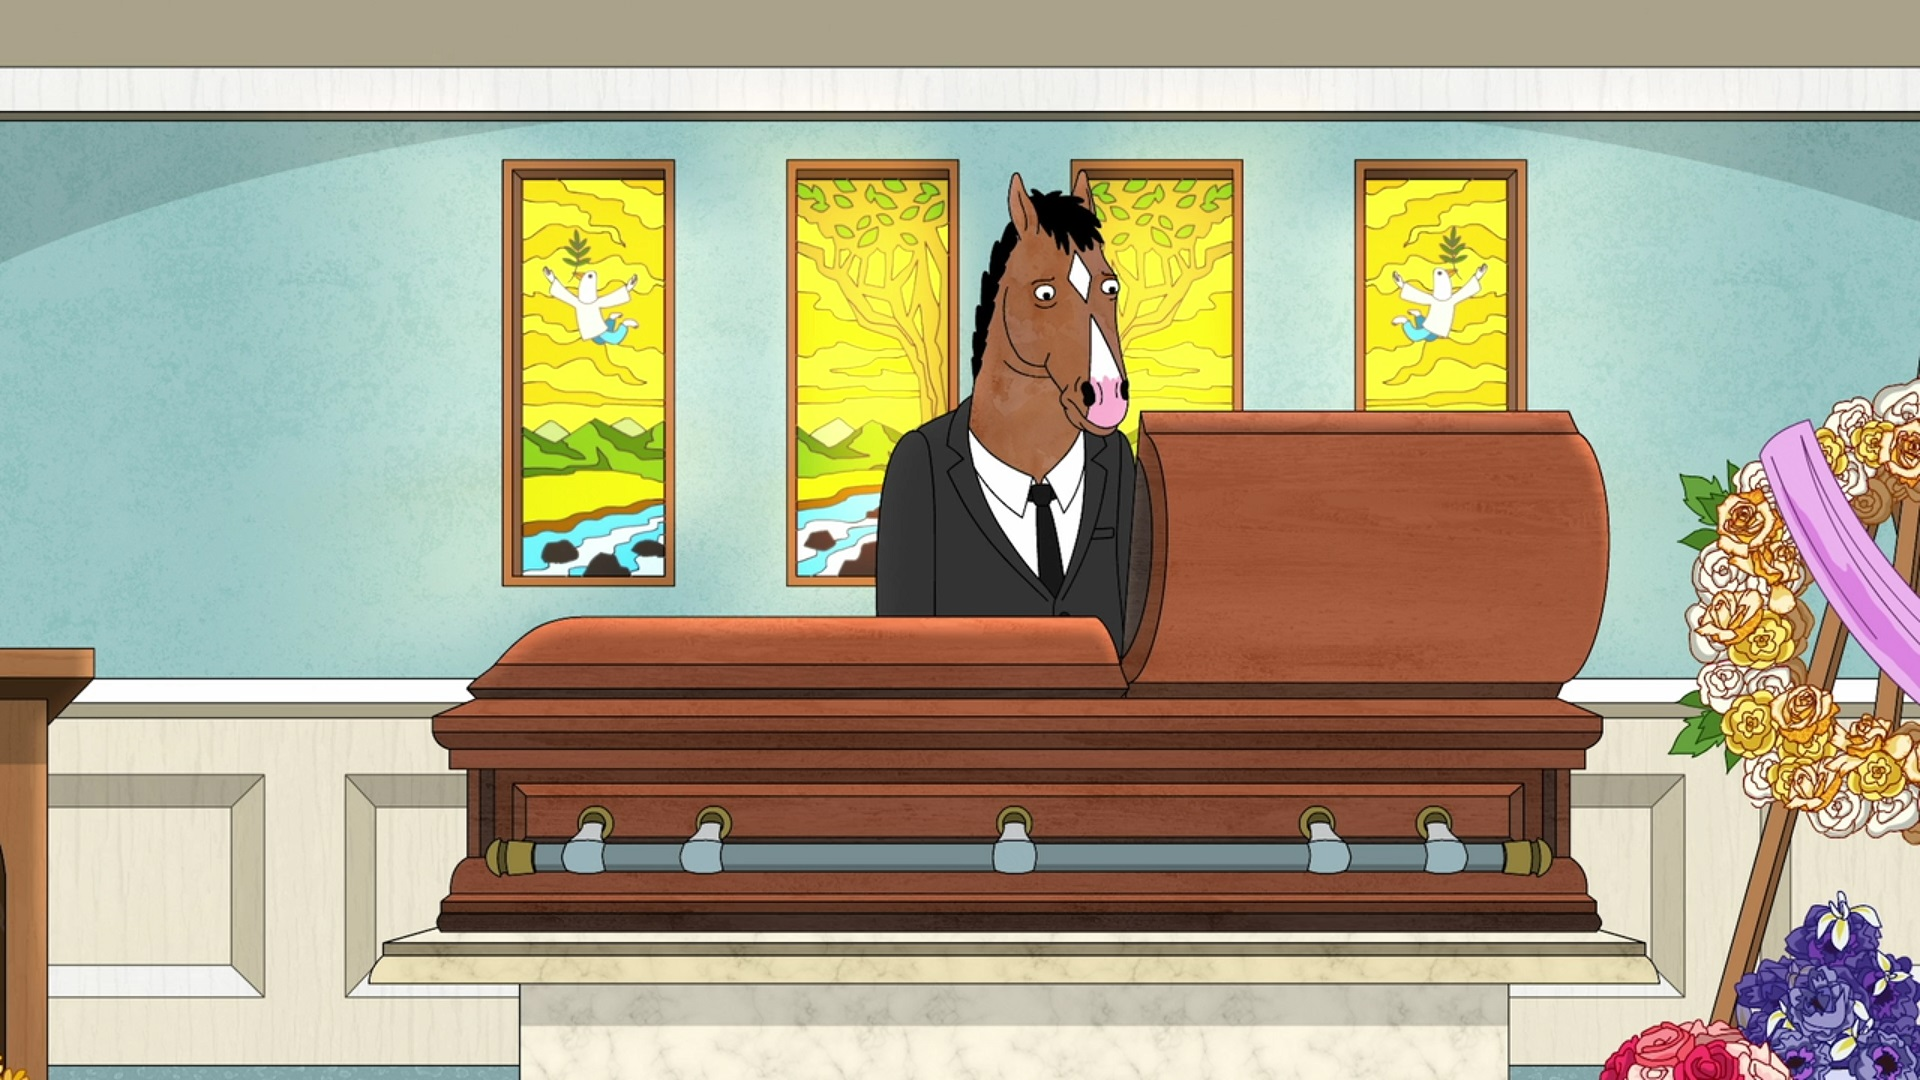 bojack horseman season 5 episode 6